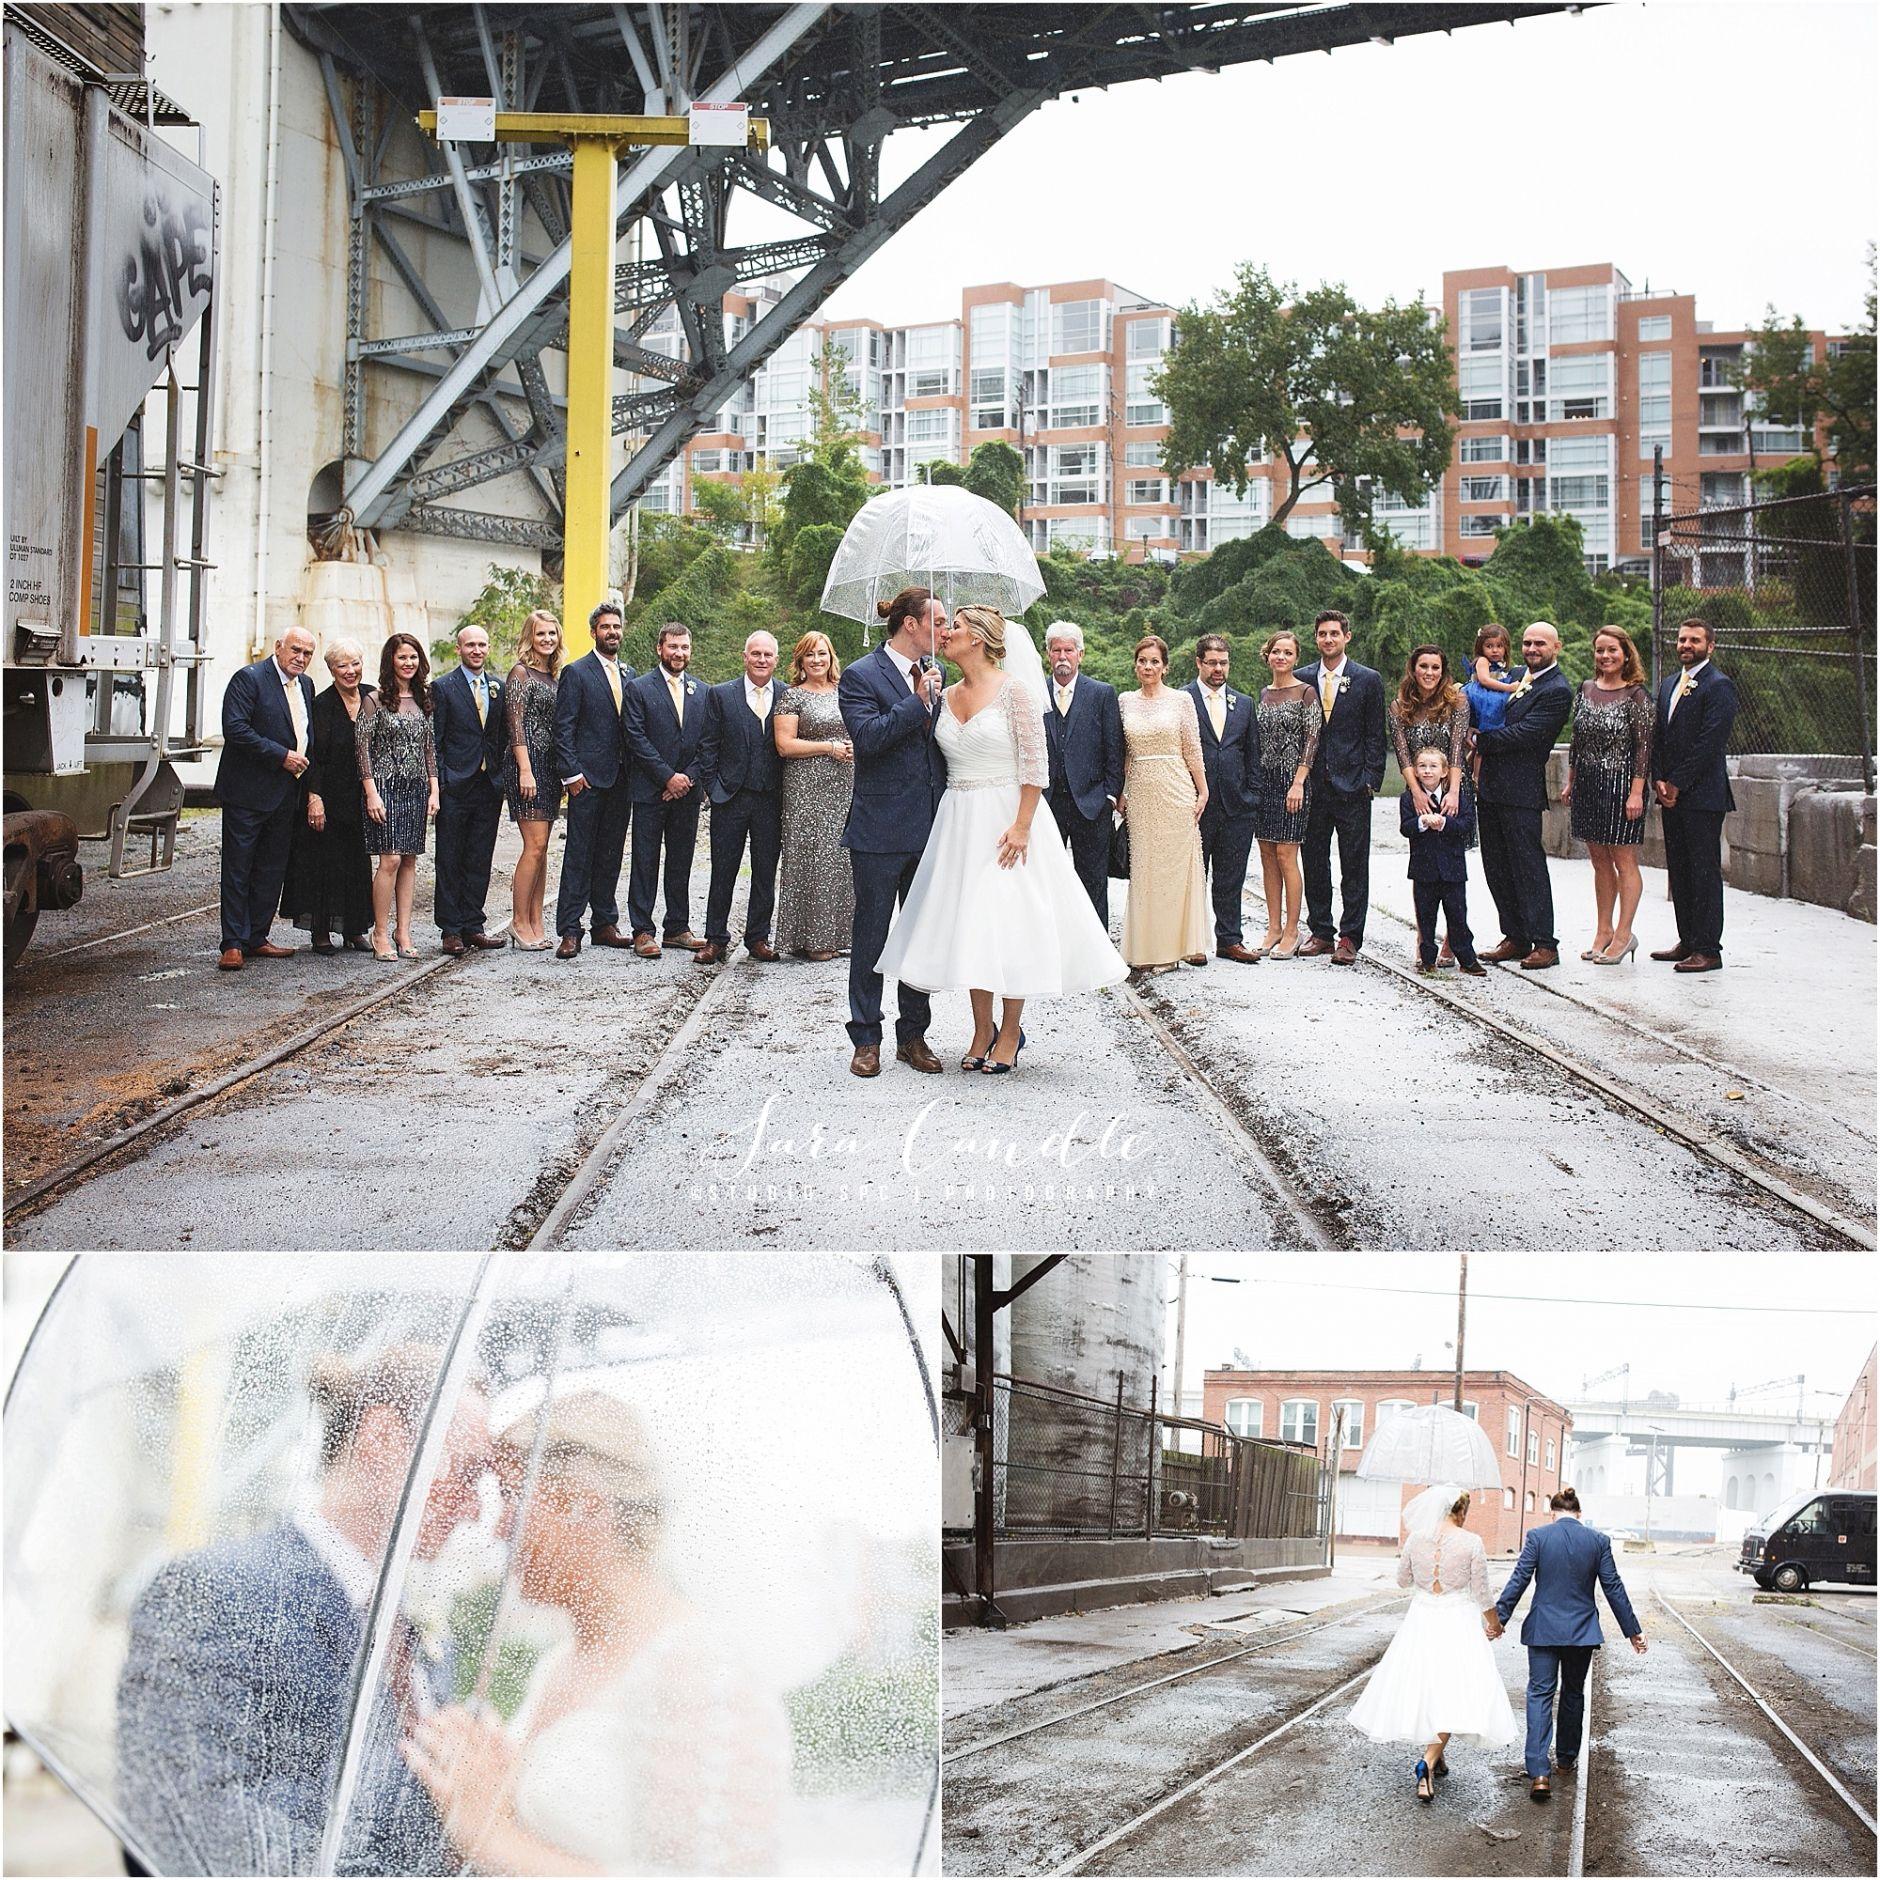 The Kelly Wedding at Music Box Supper Club | Cleveland, Ohio | Cody ...